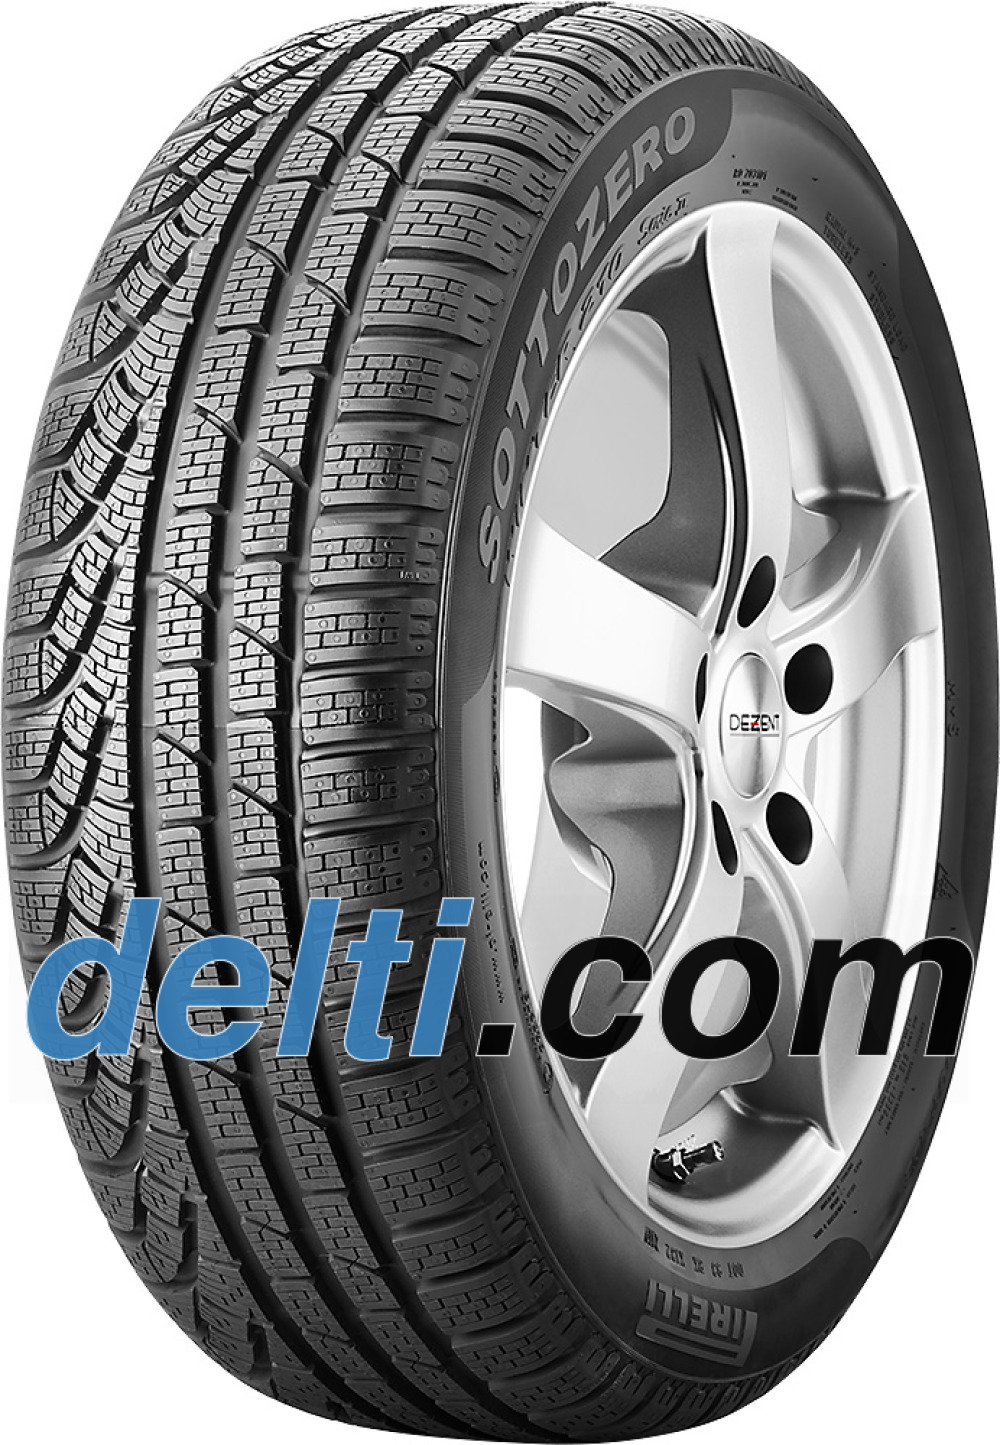 Pirelli W 210 SottoZero S2 ( 225/55 R17 97H AO, mit Felgenschutz (MFS) )